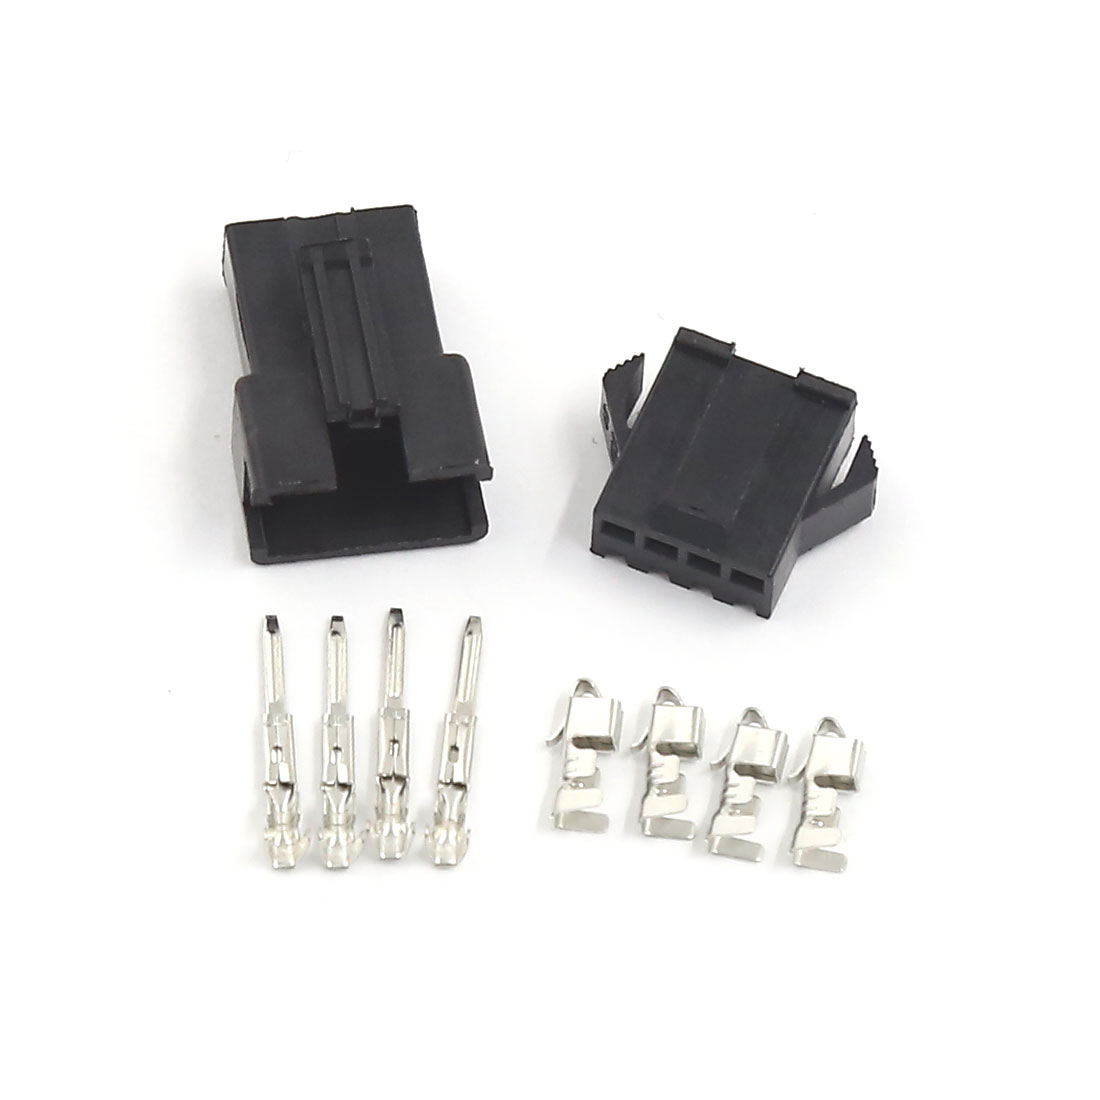 5 Sets 5 Pin Female Slot Power Supply PCB Board Car ATX Connector